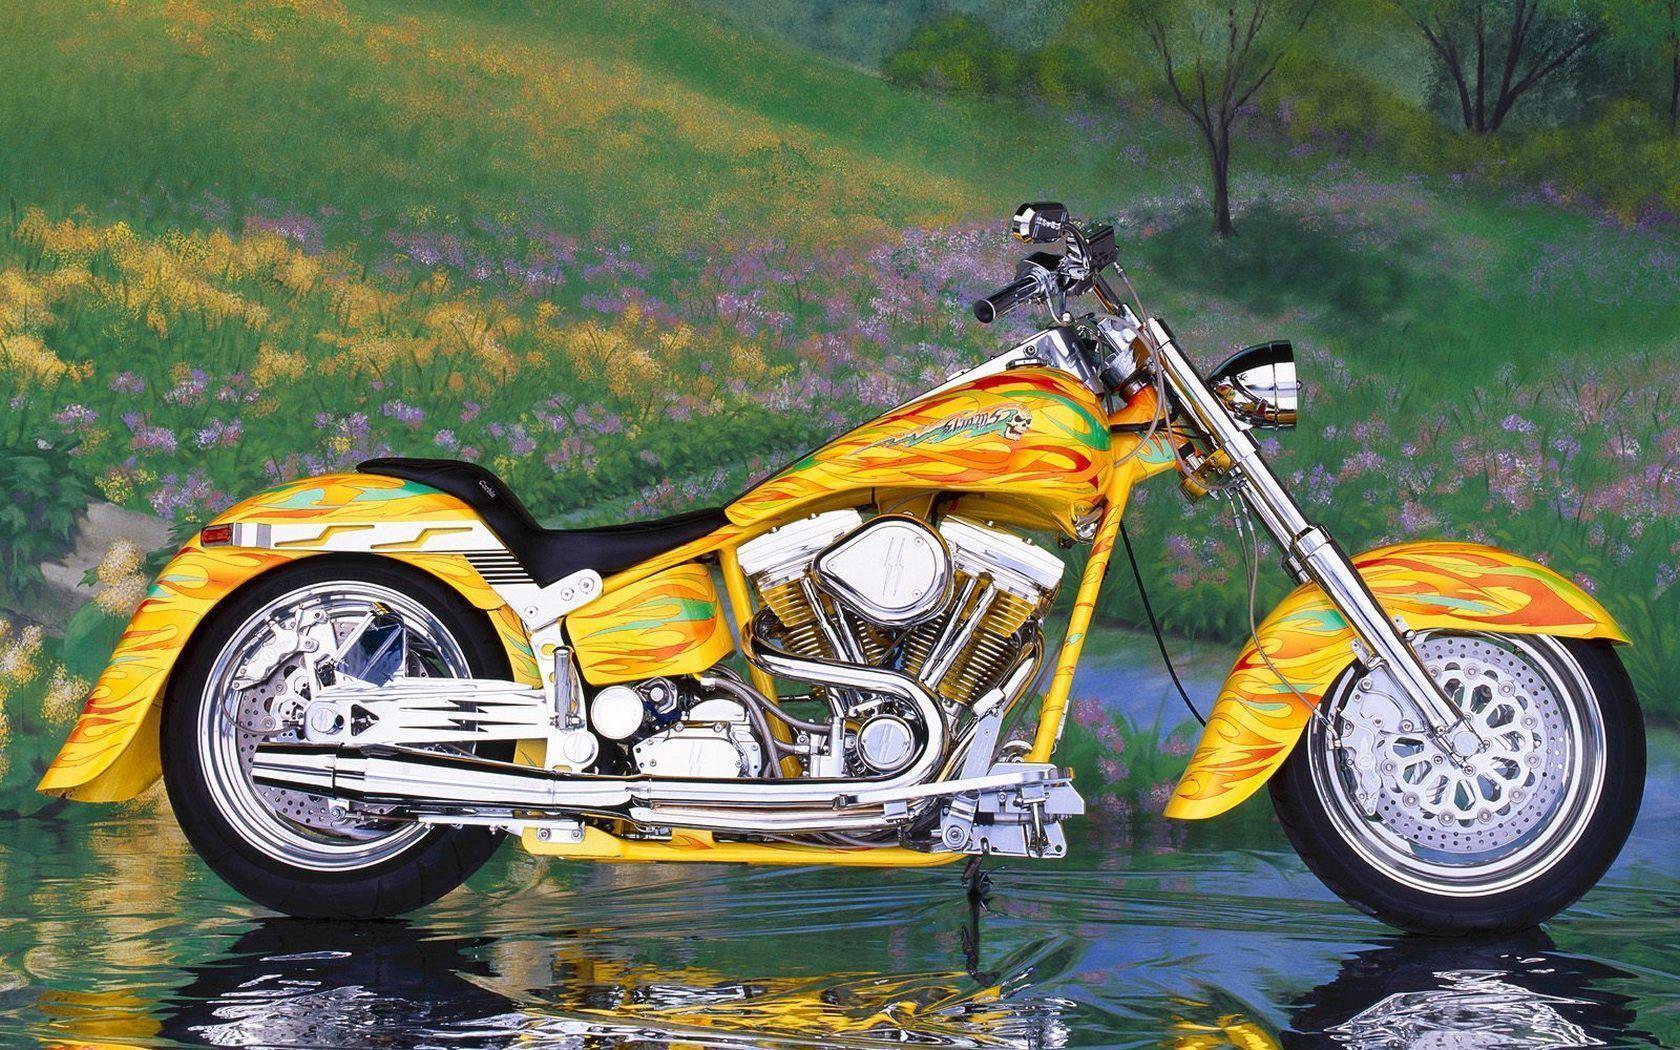 Harley Davidson Motorcycles Wallpapers - Wallpaper Cave